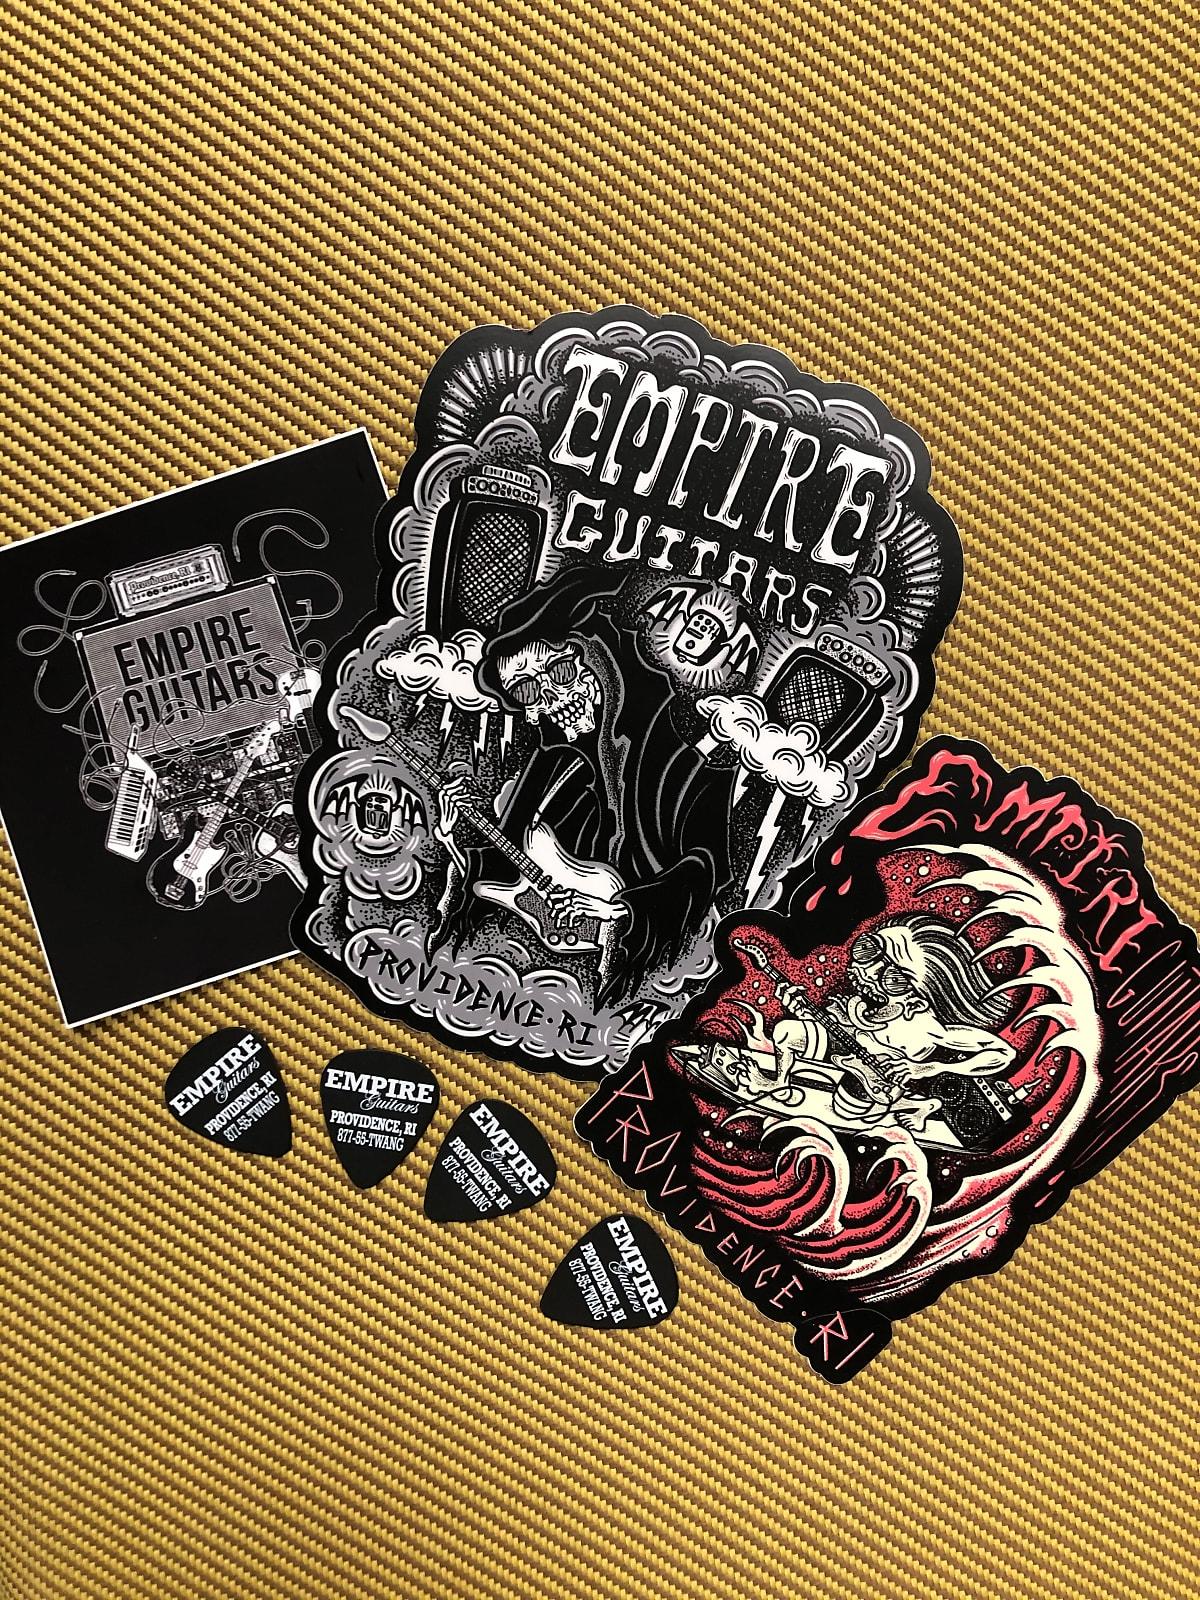 Empire Guitars Sticker Pack- 3 stickers and 4 logo picks